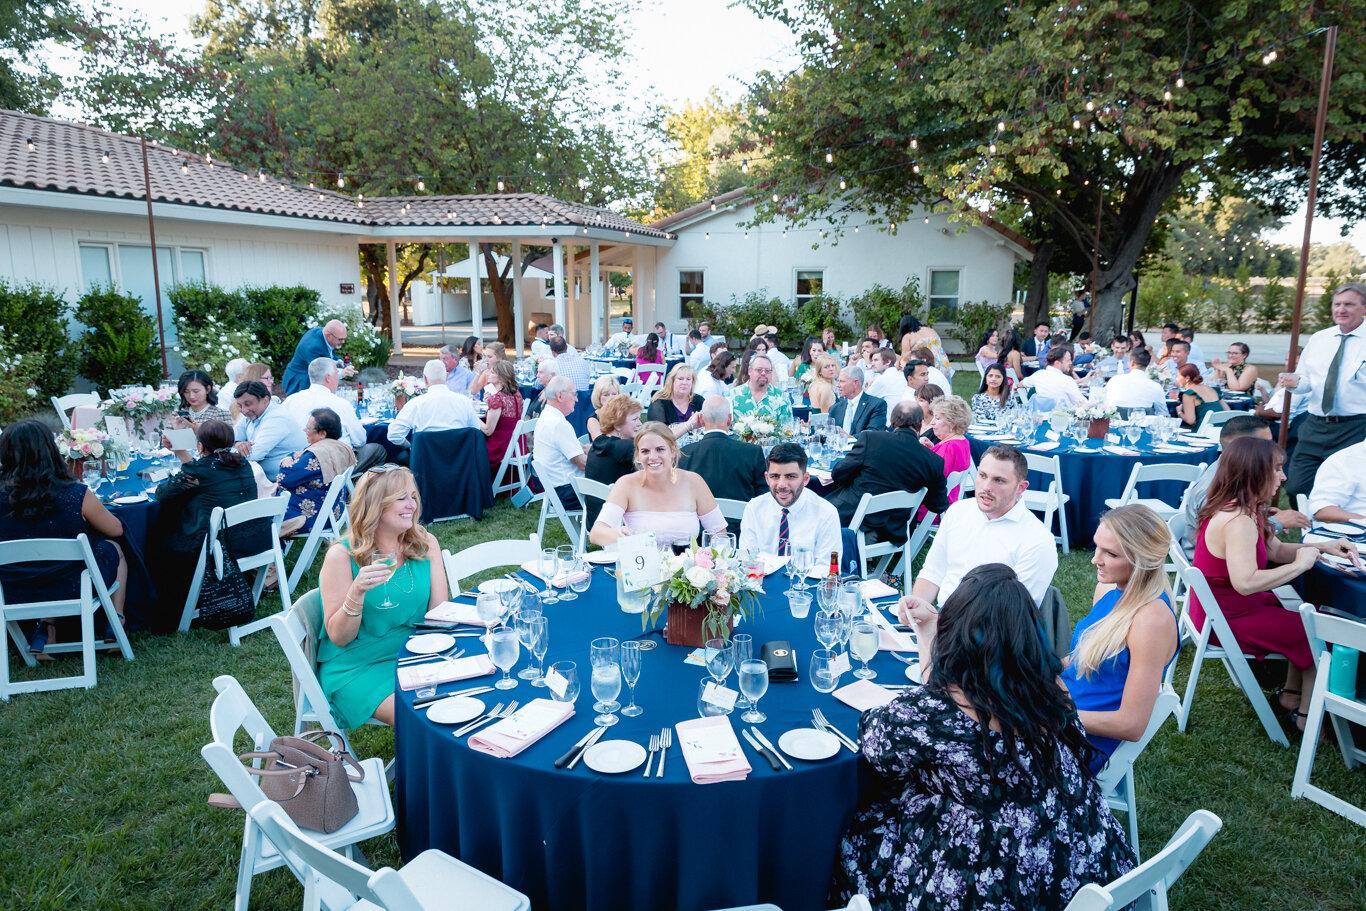 2019.08.24_Emily-Ashir-Wedding-at-the-Maples-6130.jpg